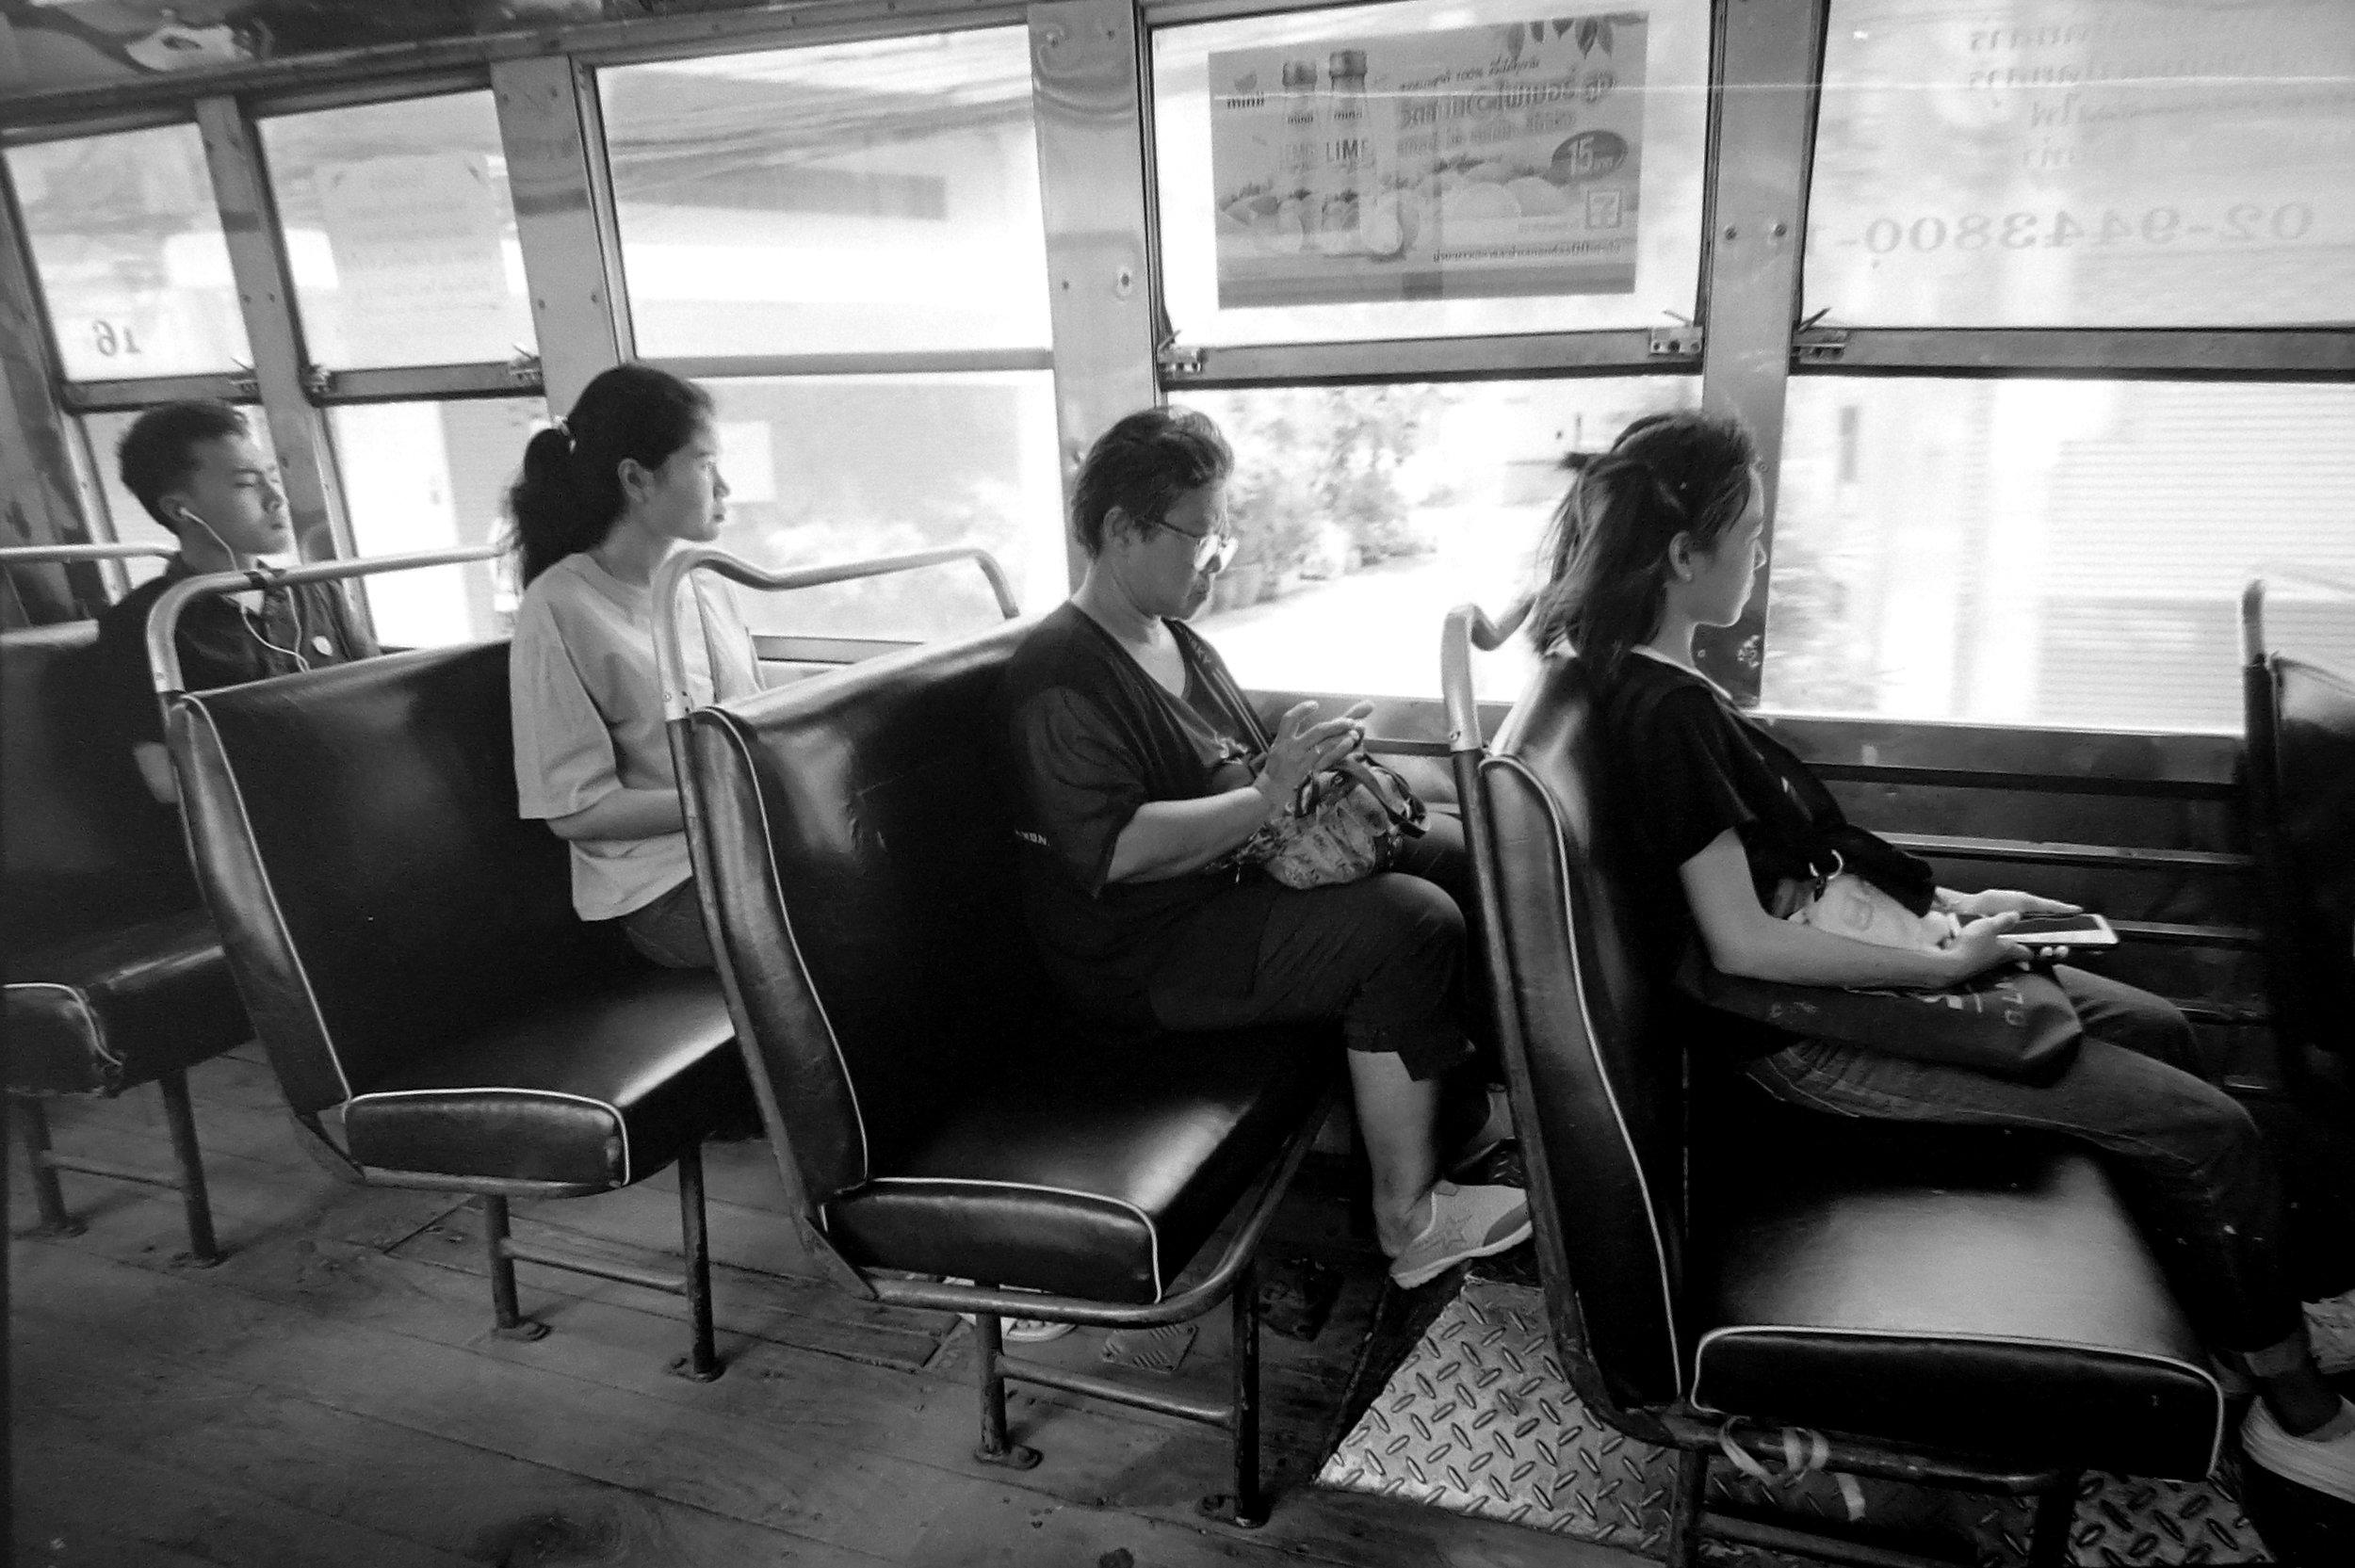 Chromacomaphoto street photography Bangkok Leica M3 super angulon 21mm 3 4 tri x Thailand film (4).JPG